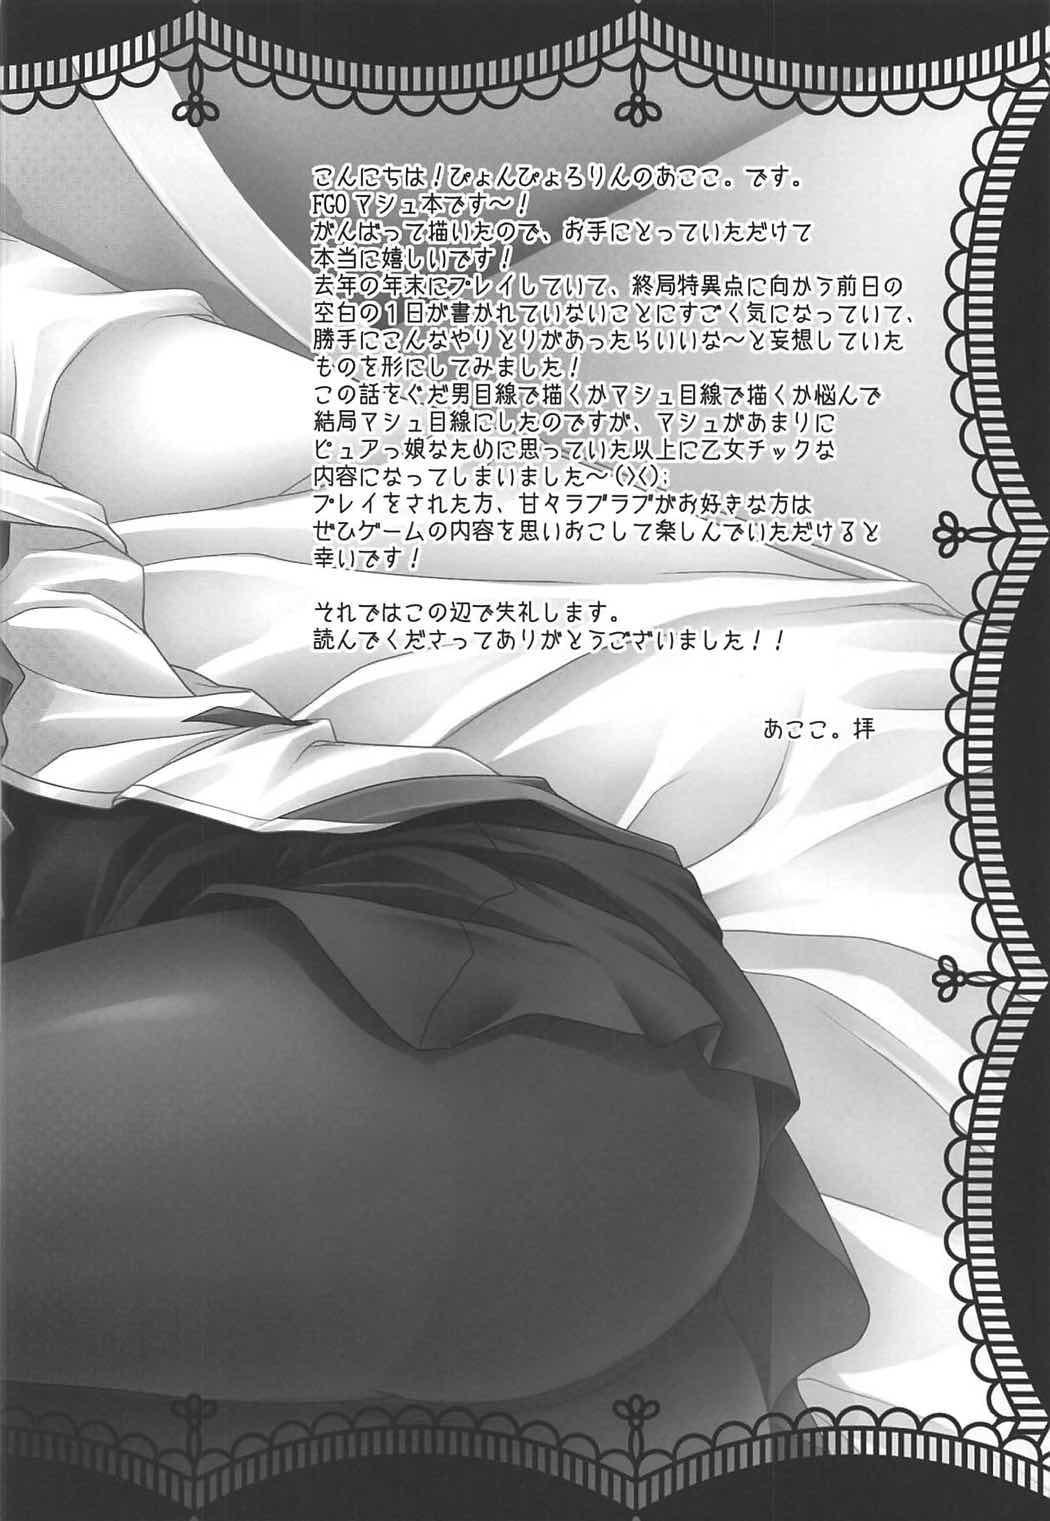 (COMIC1☆11) [Pyonpyororin (Akoko.)] - 1 day ago - (Fate/Grand Order) 26